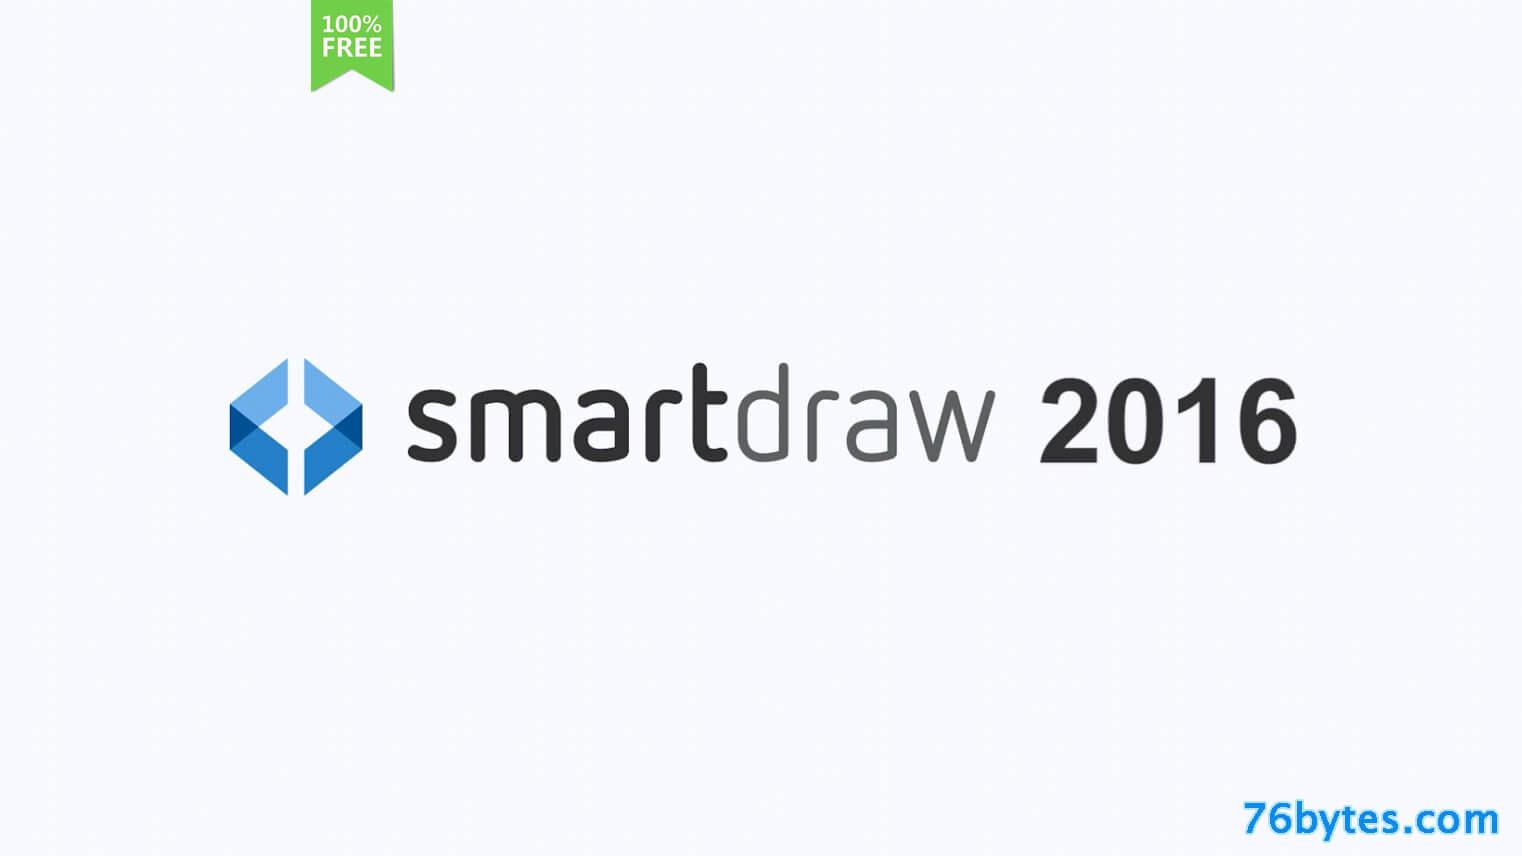 Smartdraw diagram crack gratis free full version smartdraw crack 2016 enterprise license key ccuart Choice Image